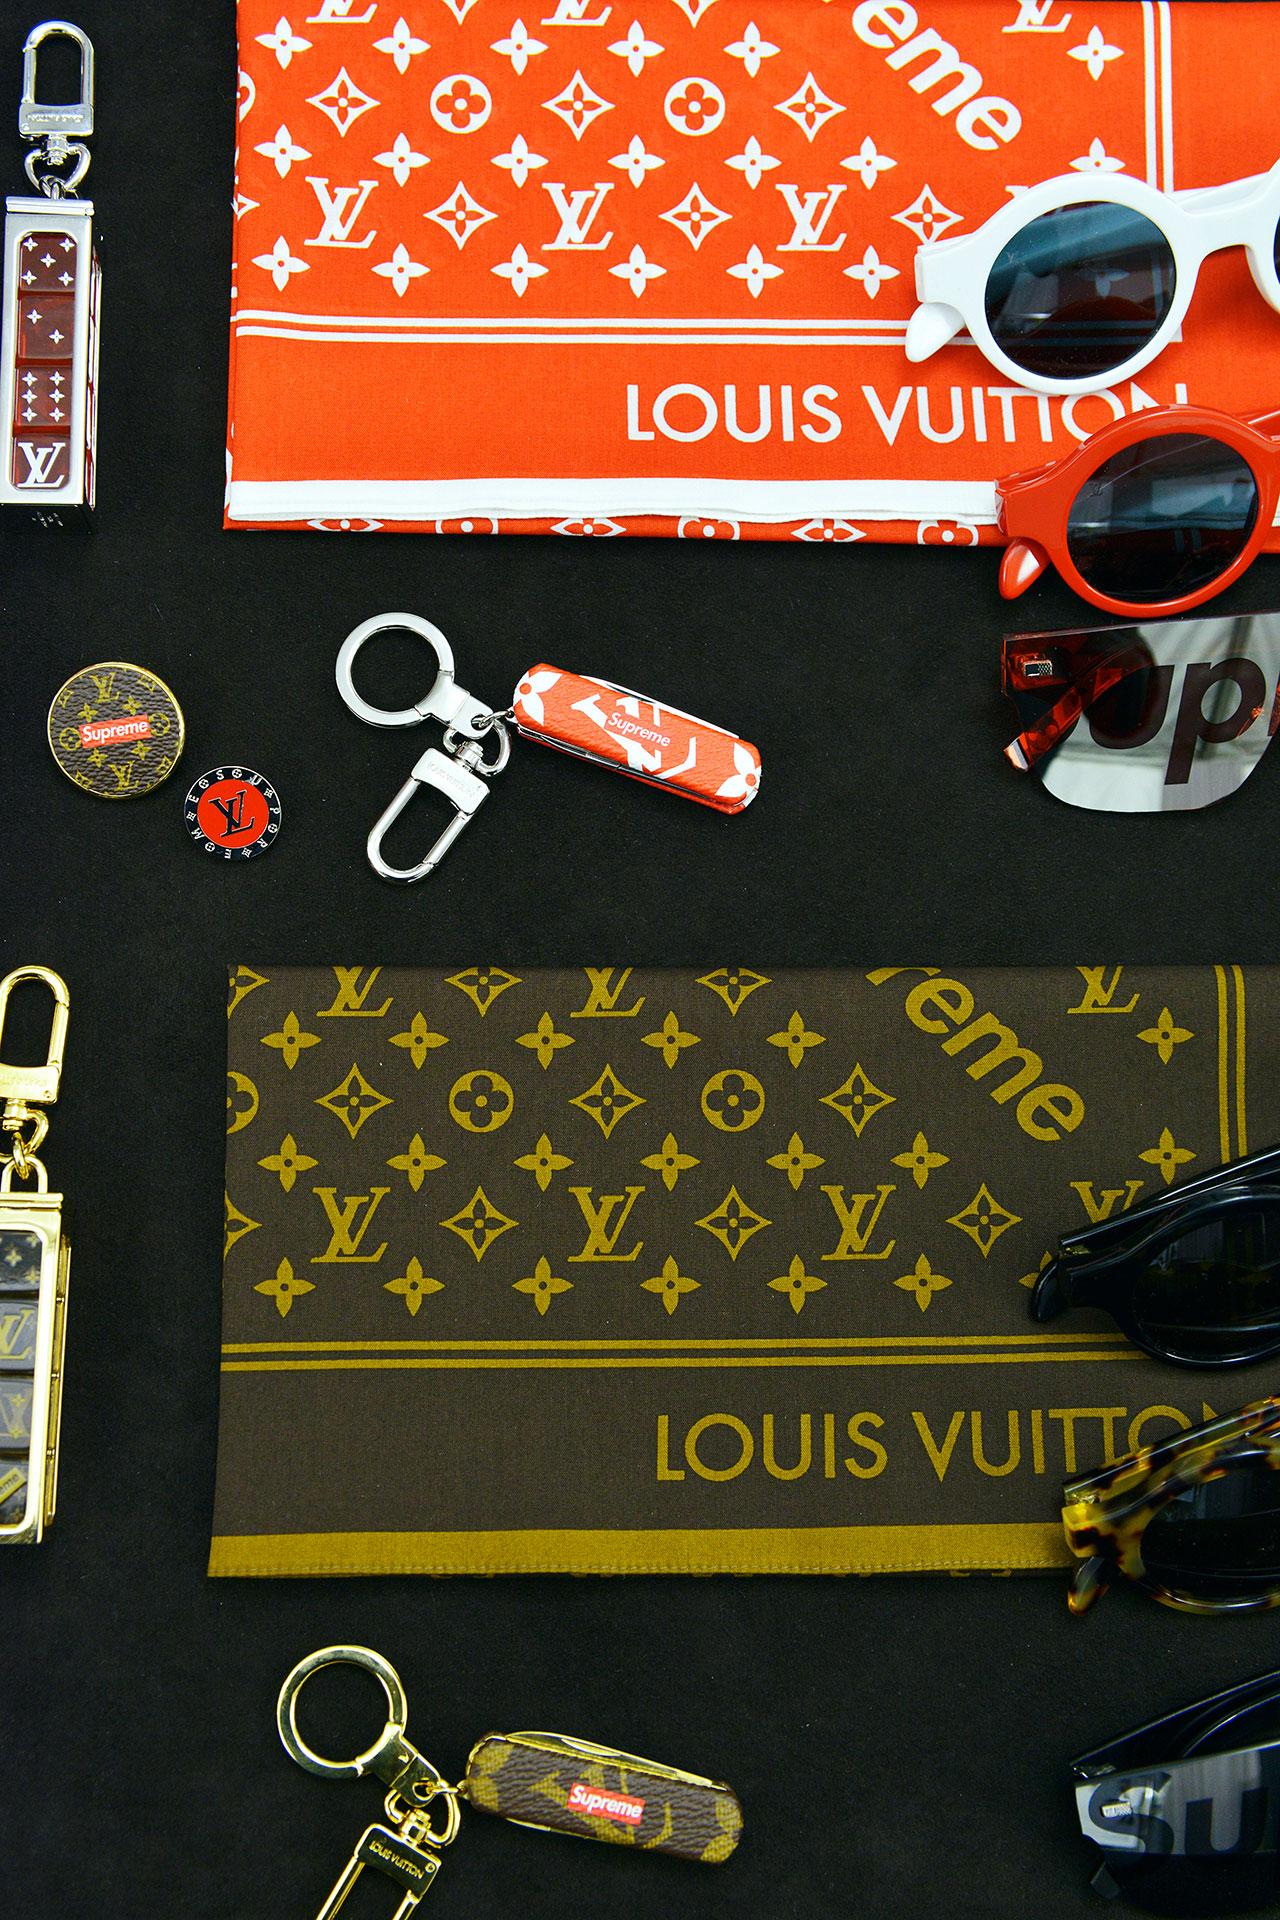 Louis Vuitton in collaboration with Supreme ©Louis Vuitton / Matthieu Dortomb